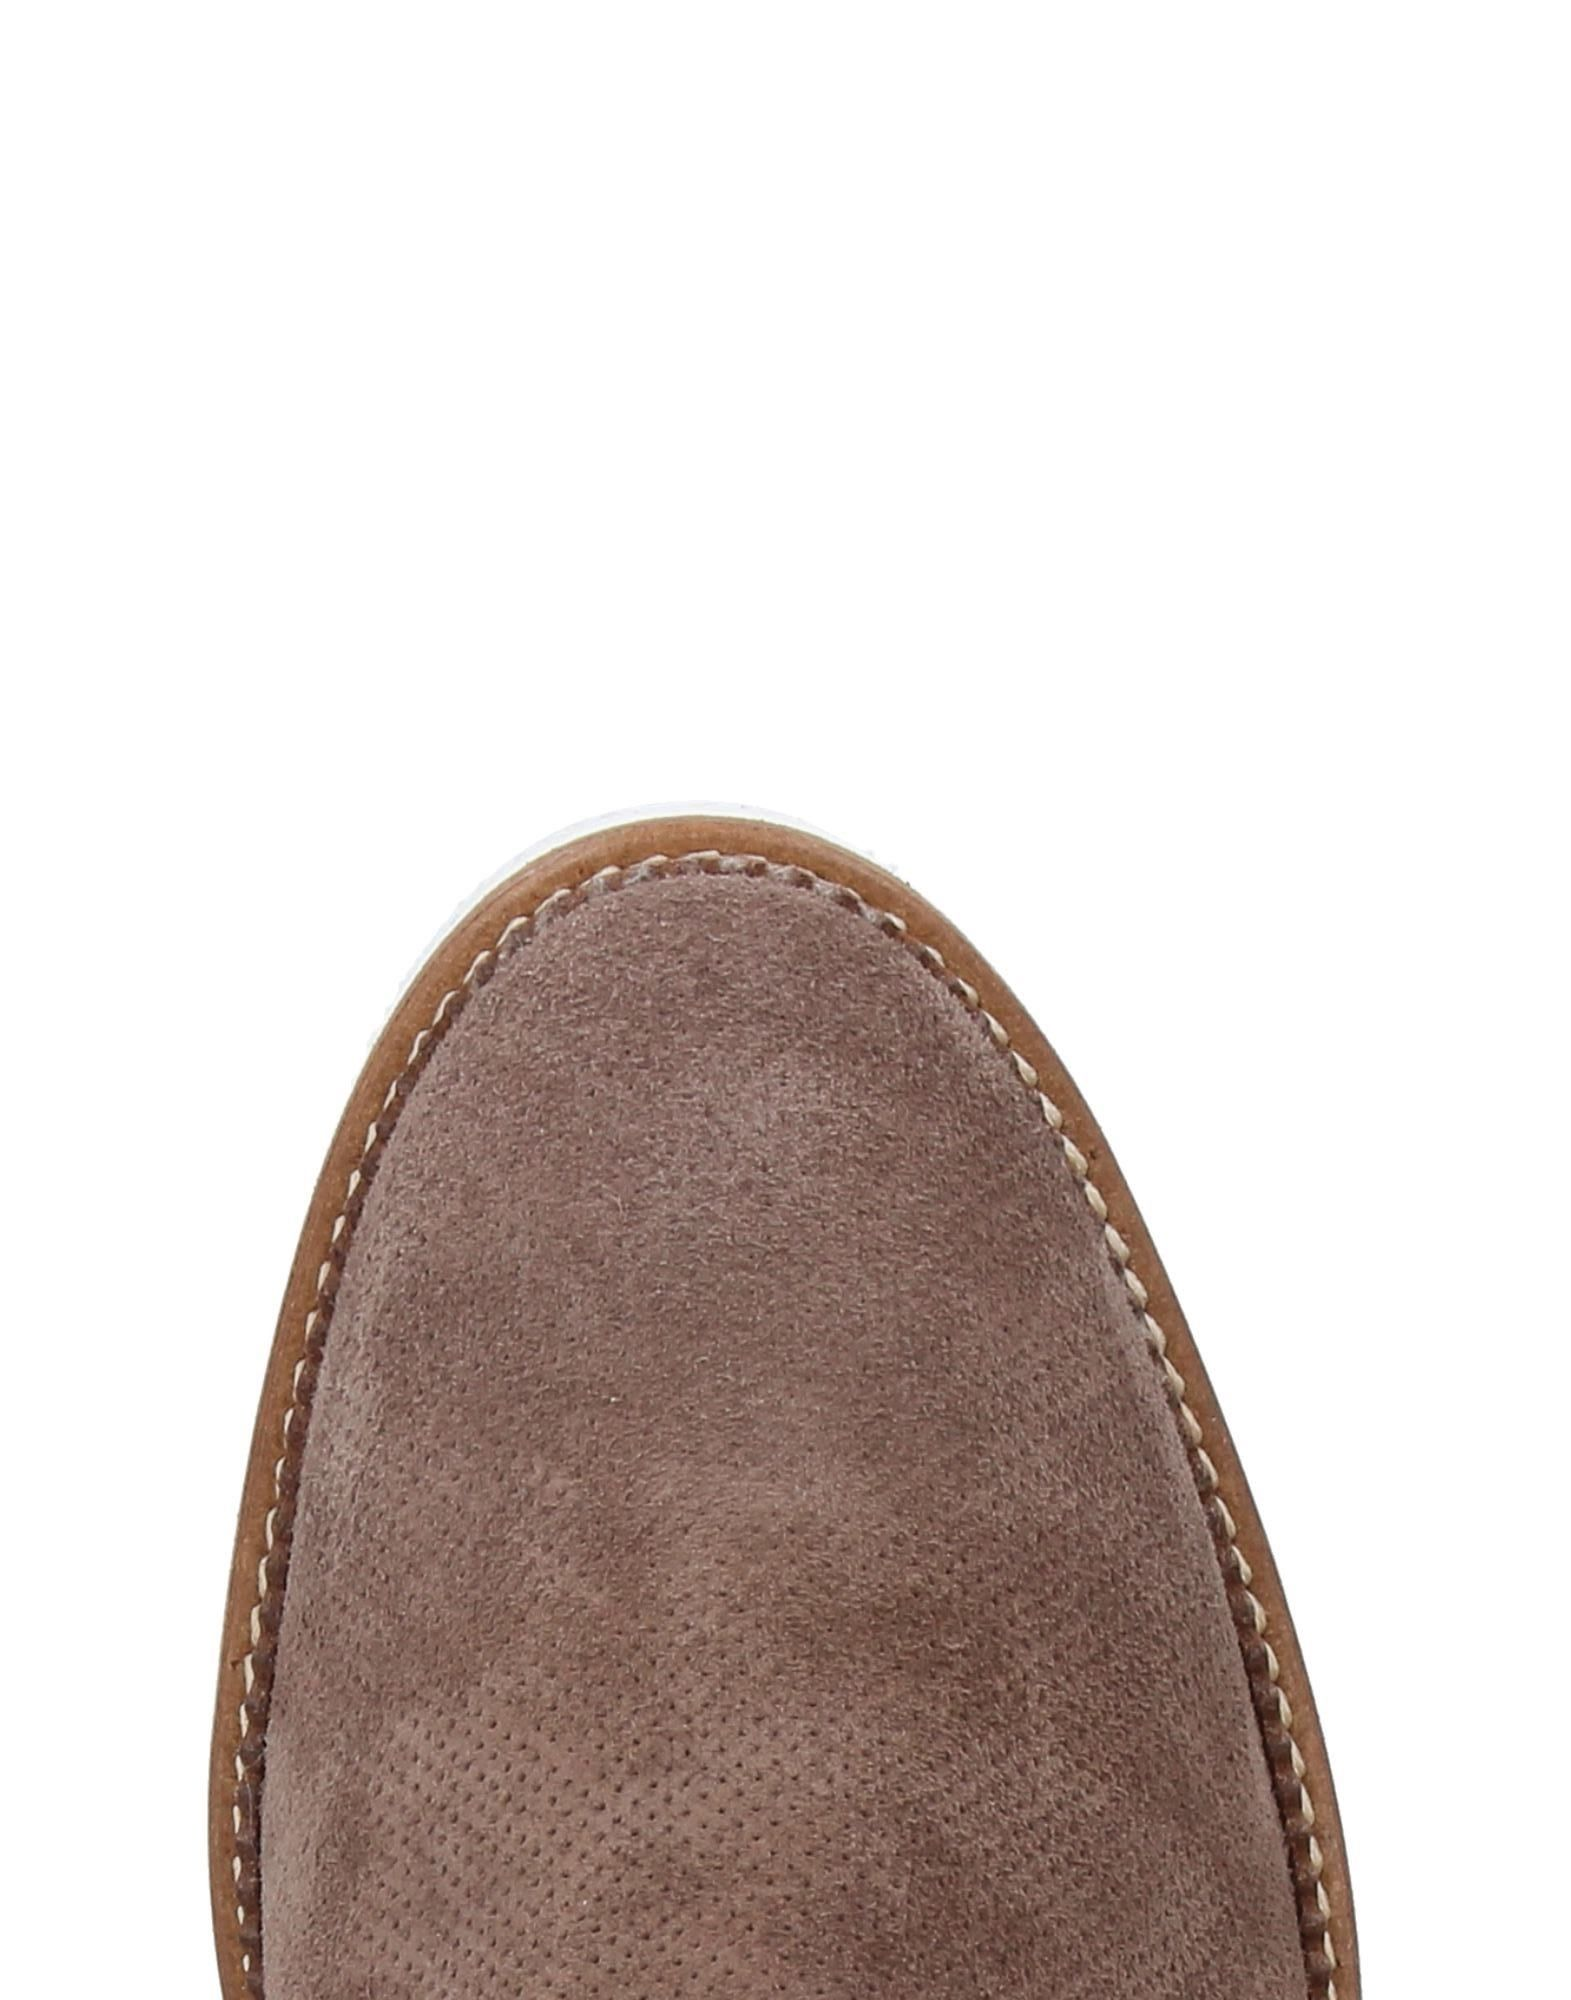 Schuhe Bagatt Schnürschuhe Herren  11413003MV Heiße Schuhe  1c9fb0